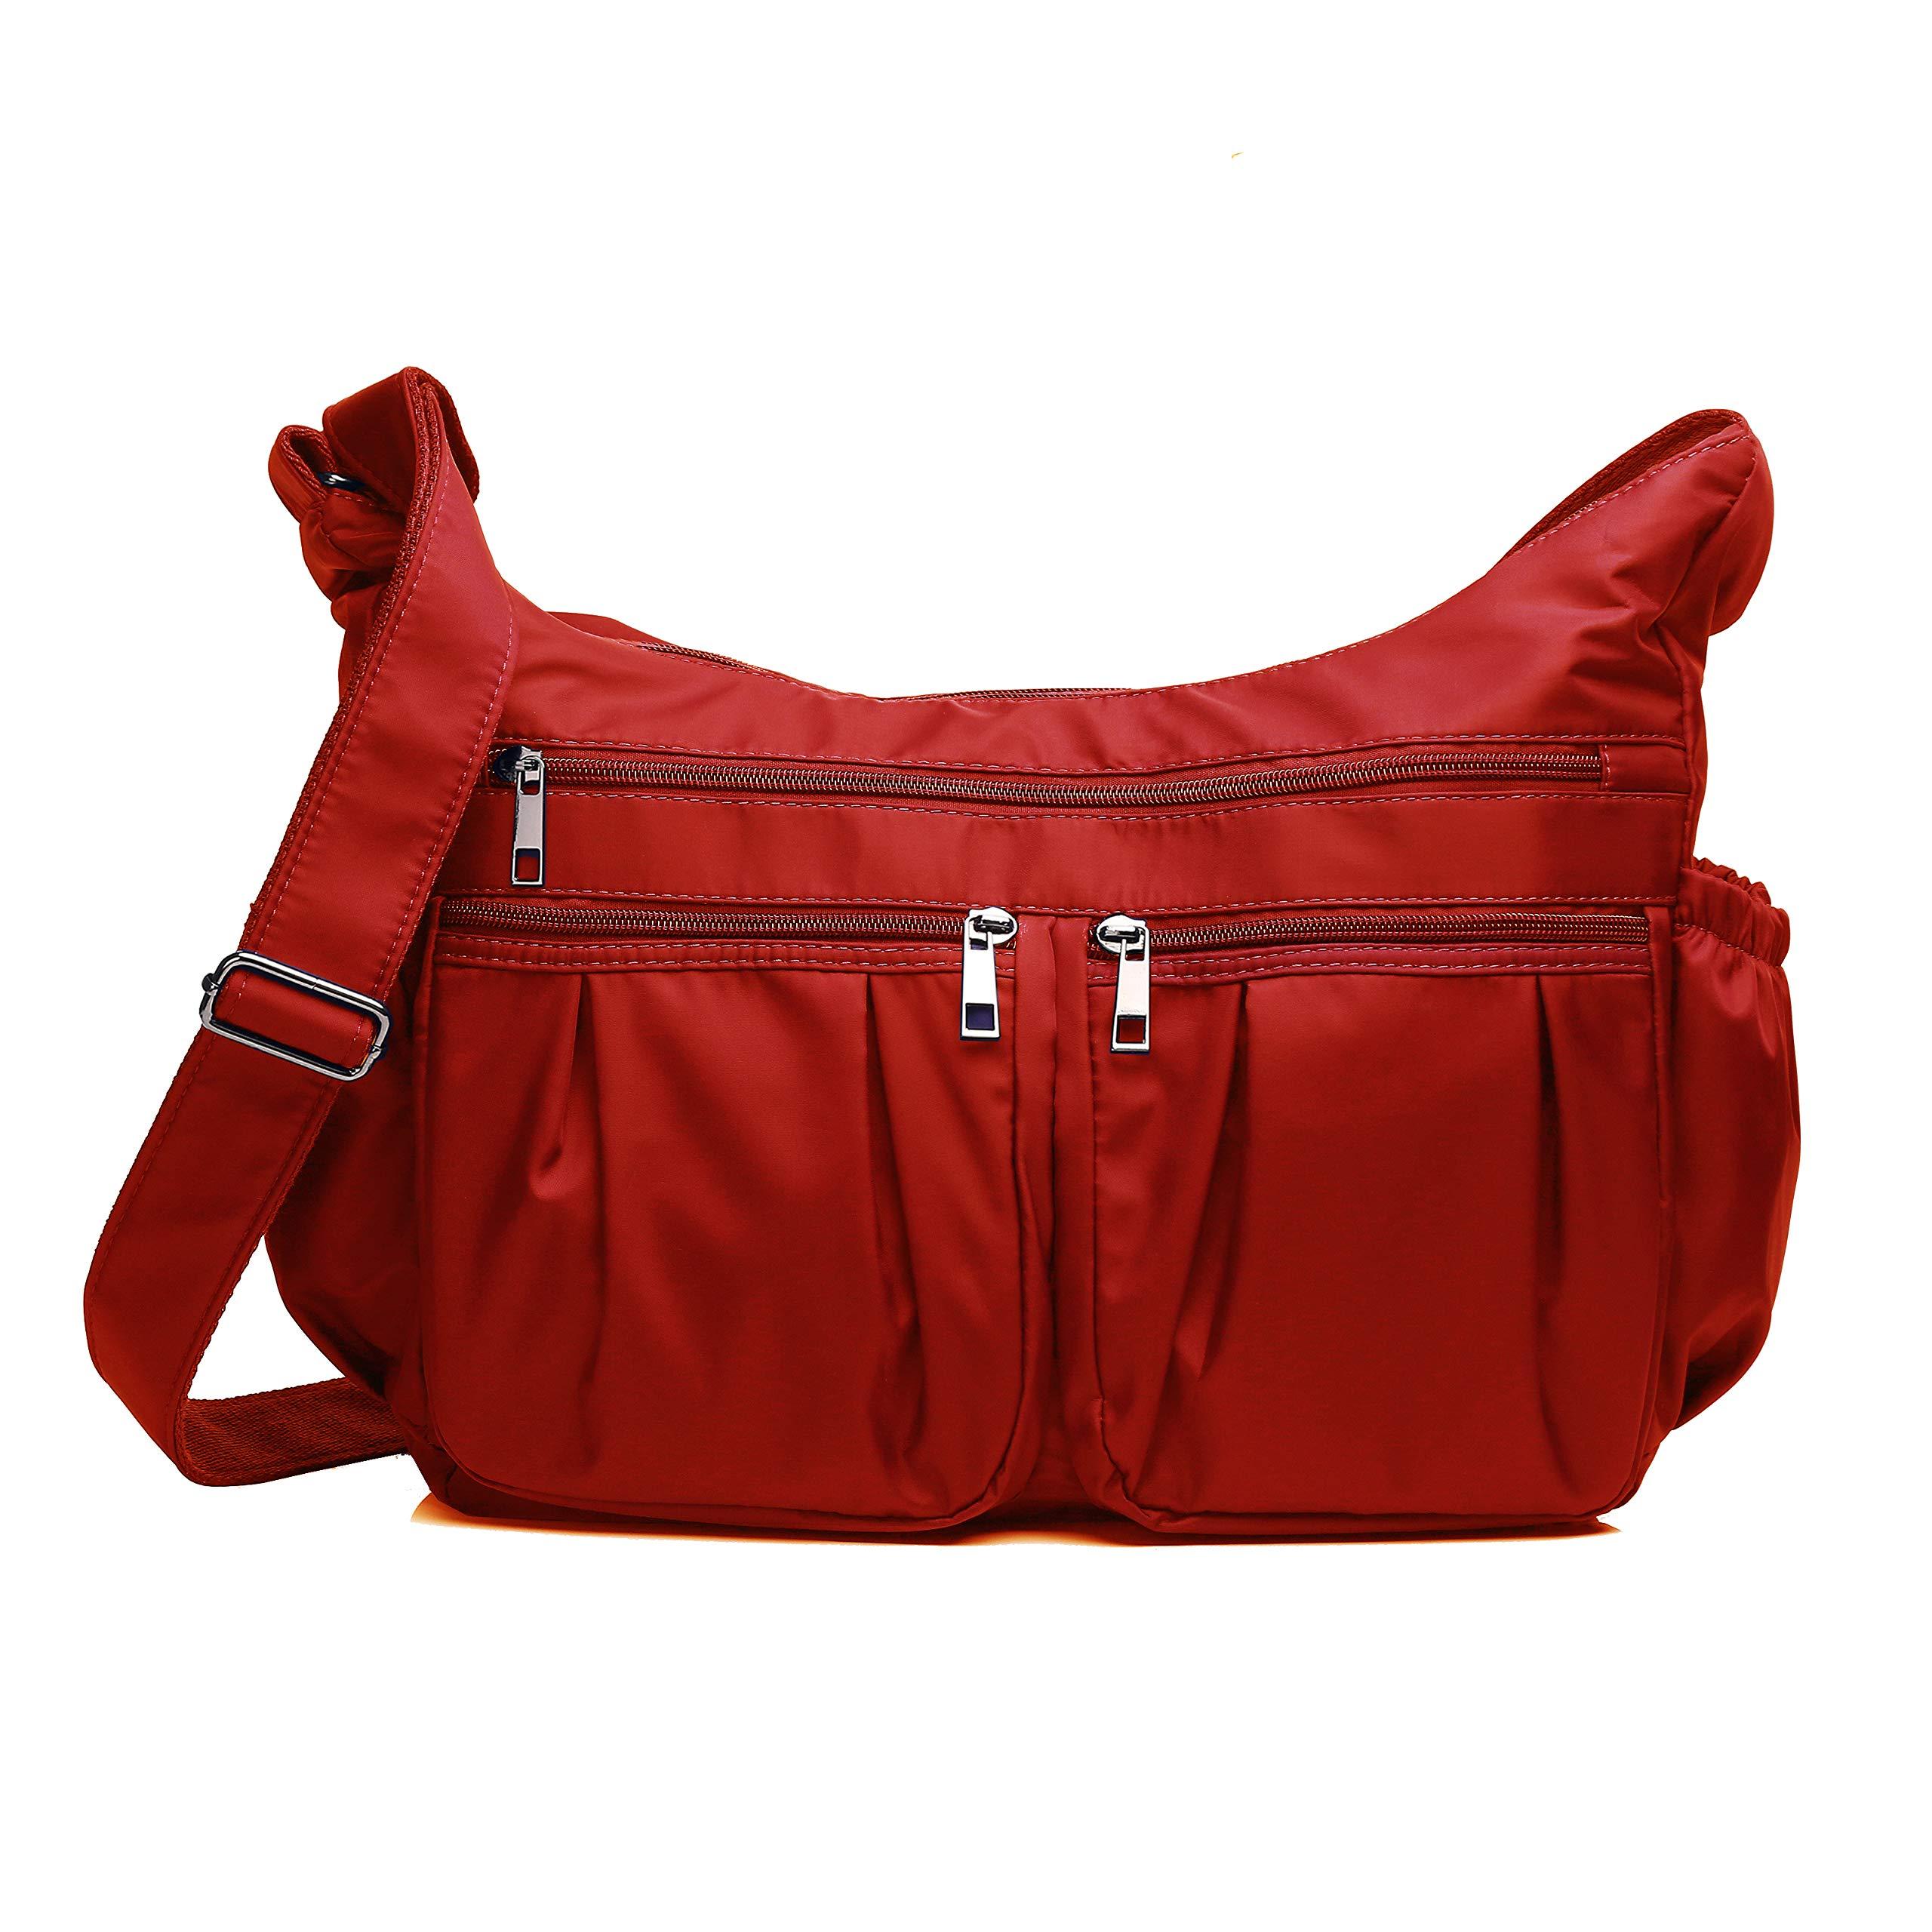 Crossbody Bags for Women, Multi Pocket Shoulder Bag Waterproof Nylon Travel Purses and Handbags (8981_ Red2-Large)